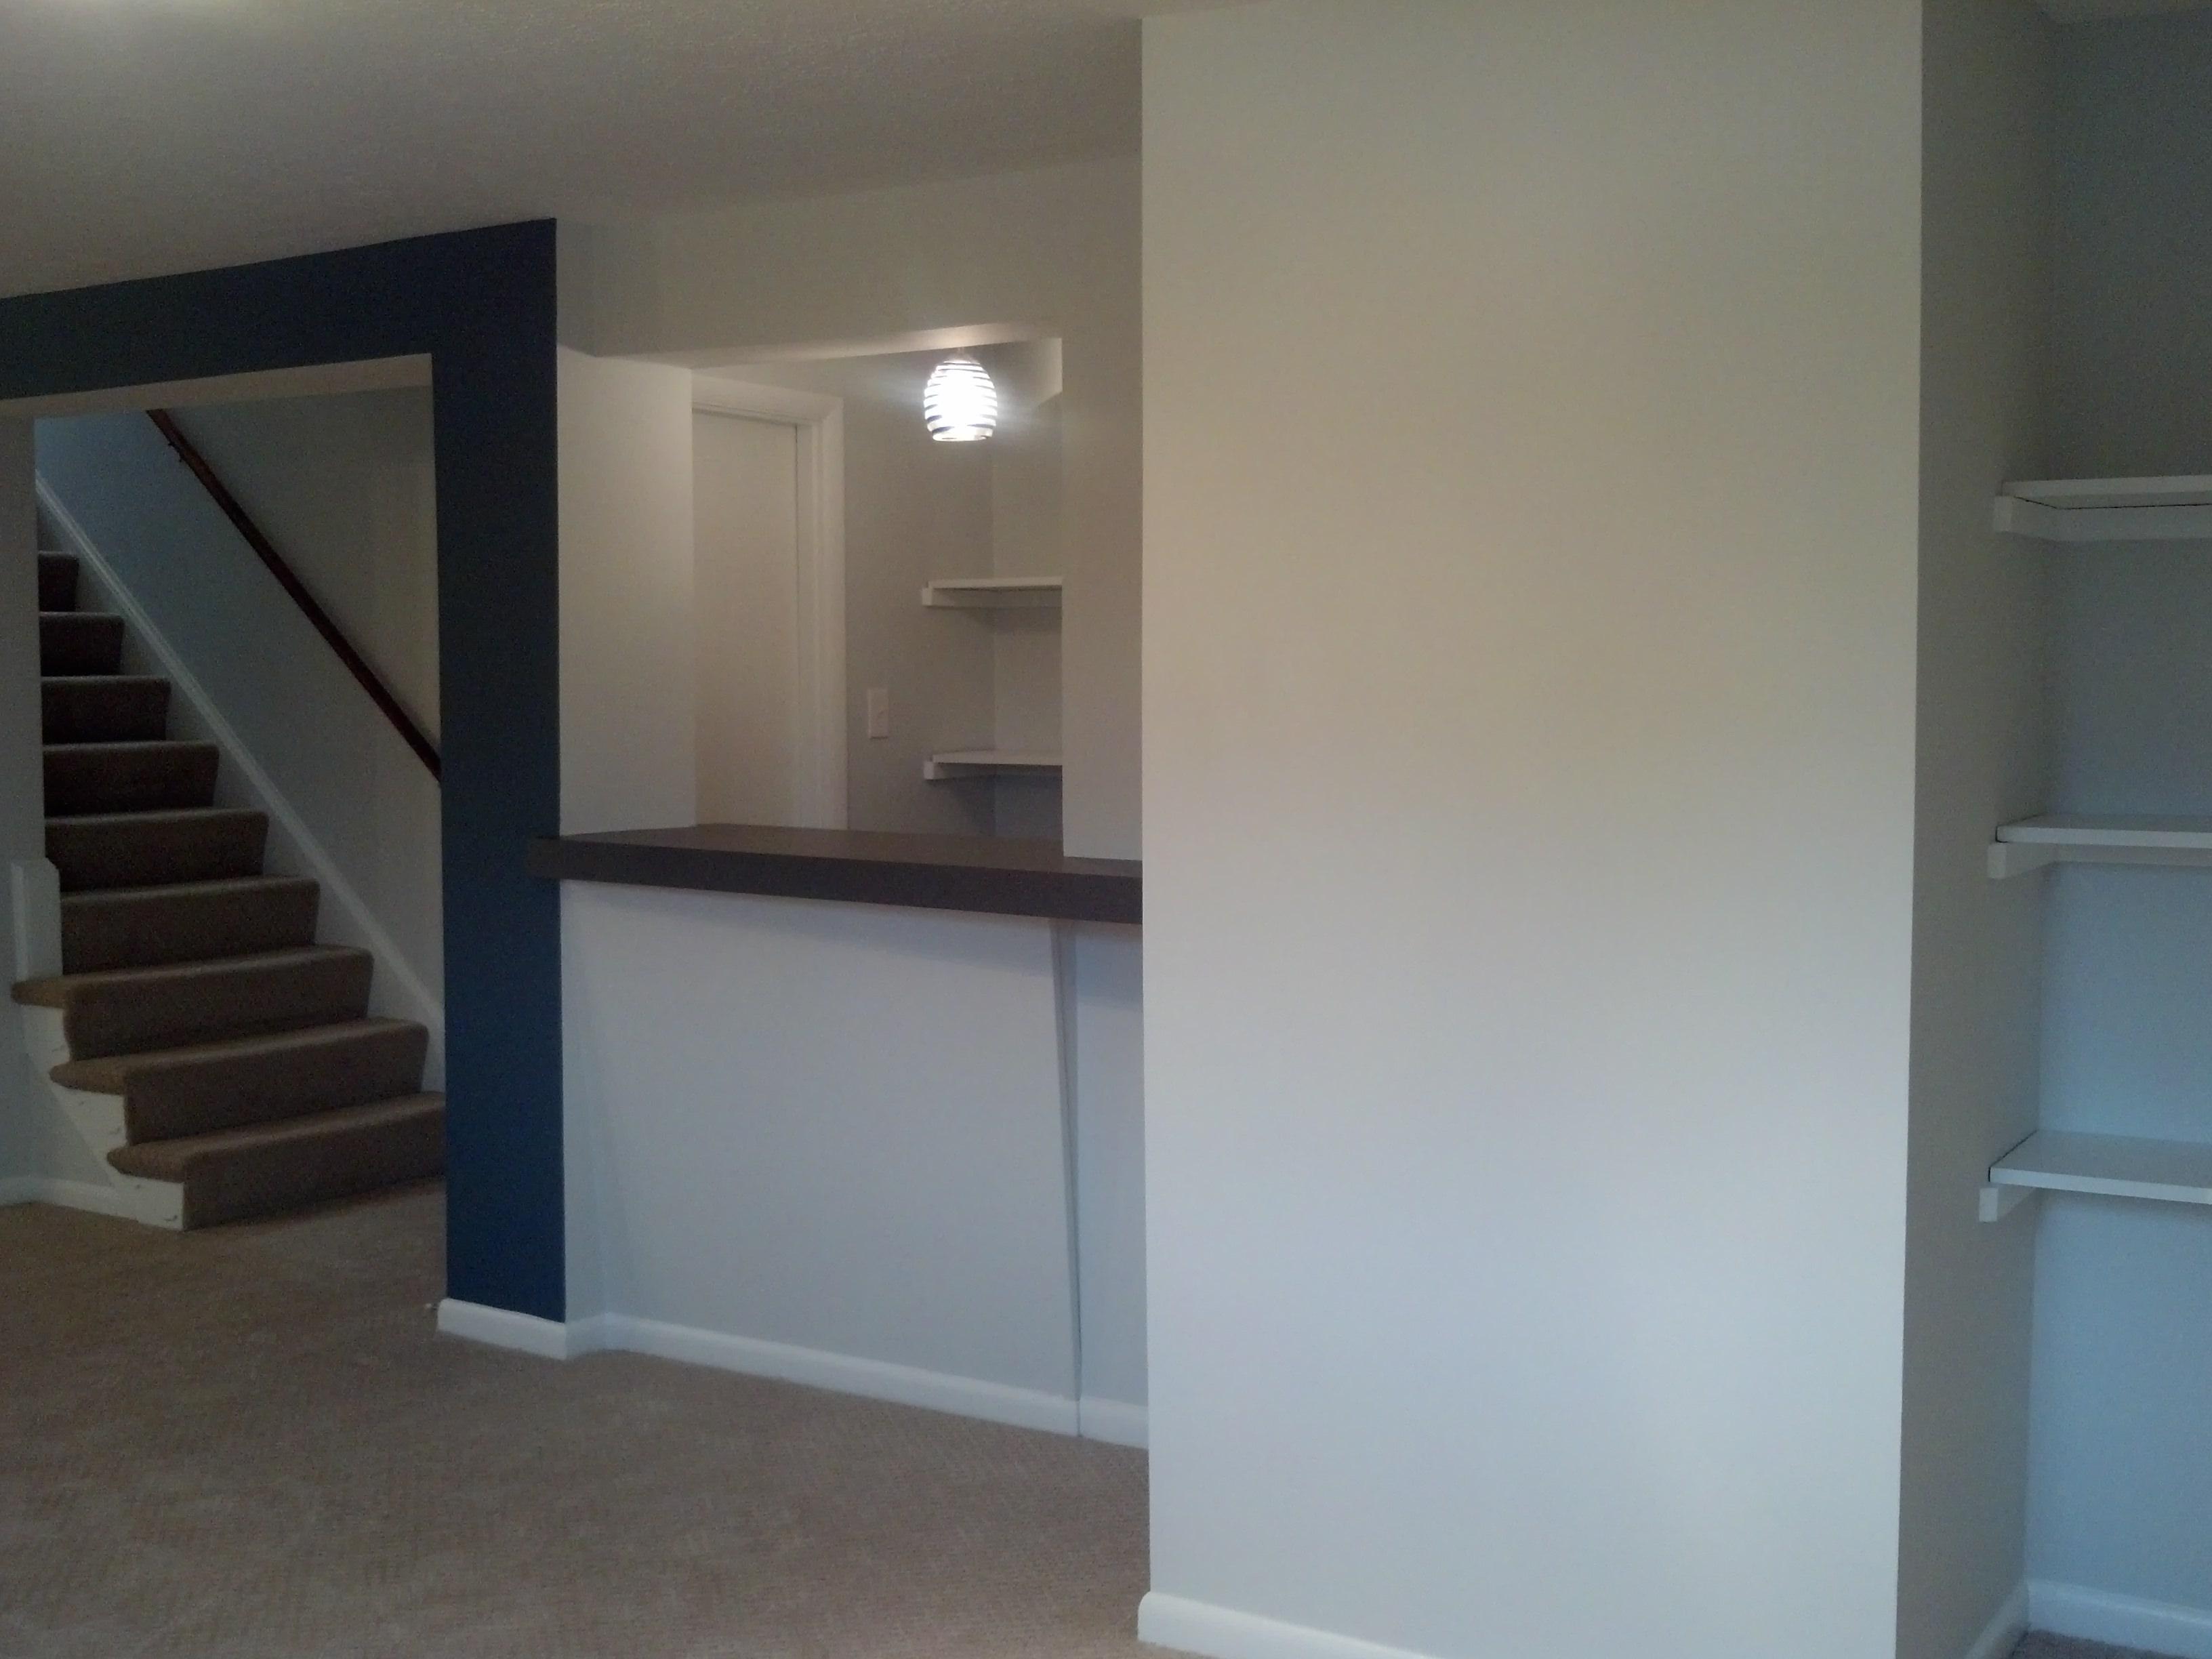 Finished Basement w/ Built-Ins & Bar